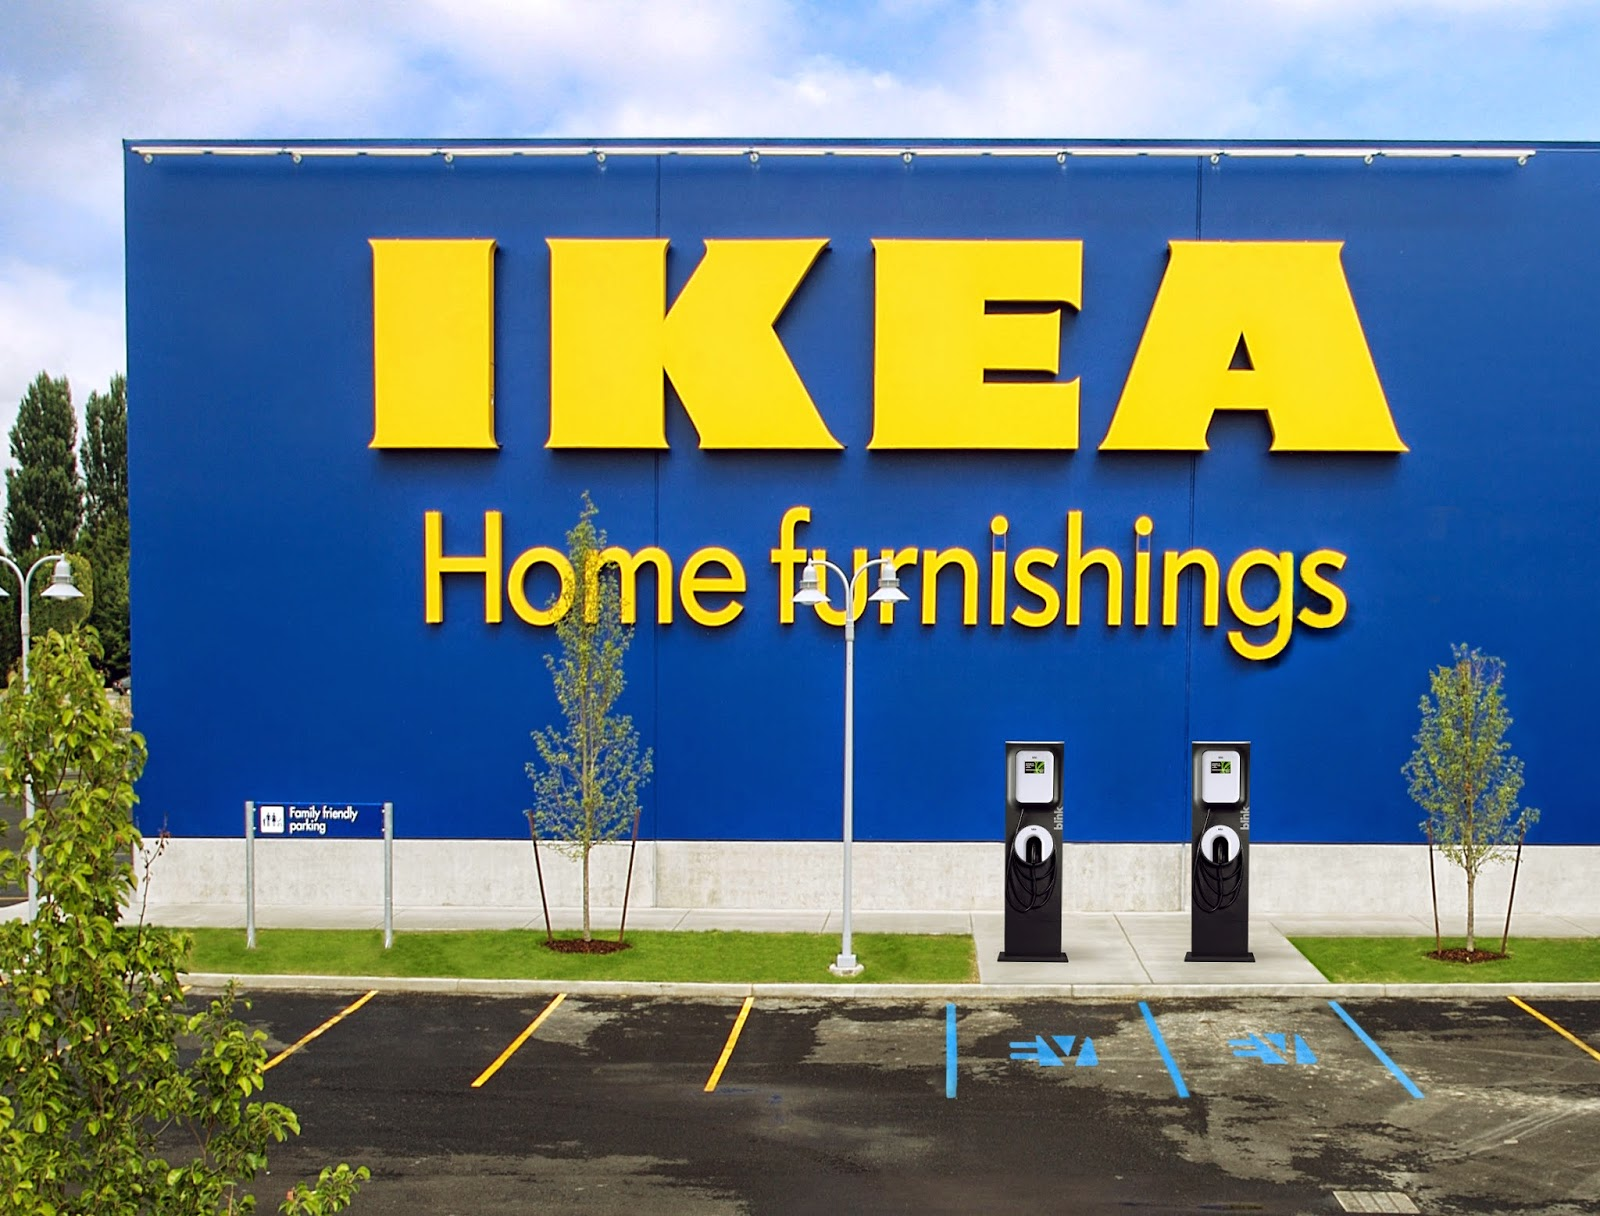 Hutschachtel Ikea 이케아 ikea 에 맞설 소규모 공방의 전략은 bittersweet